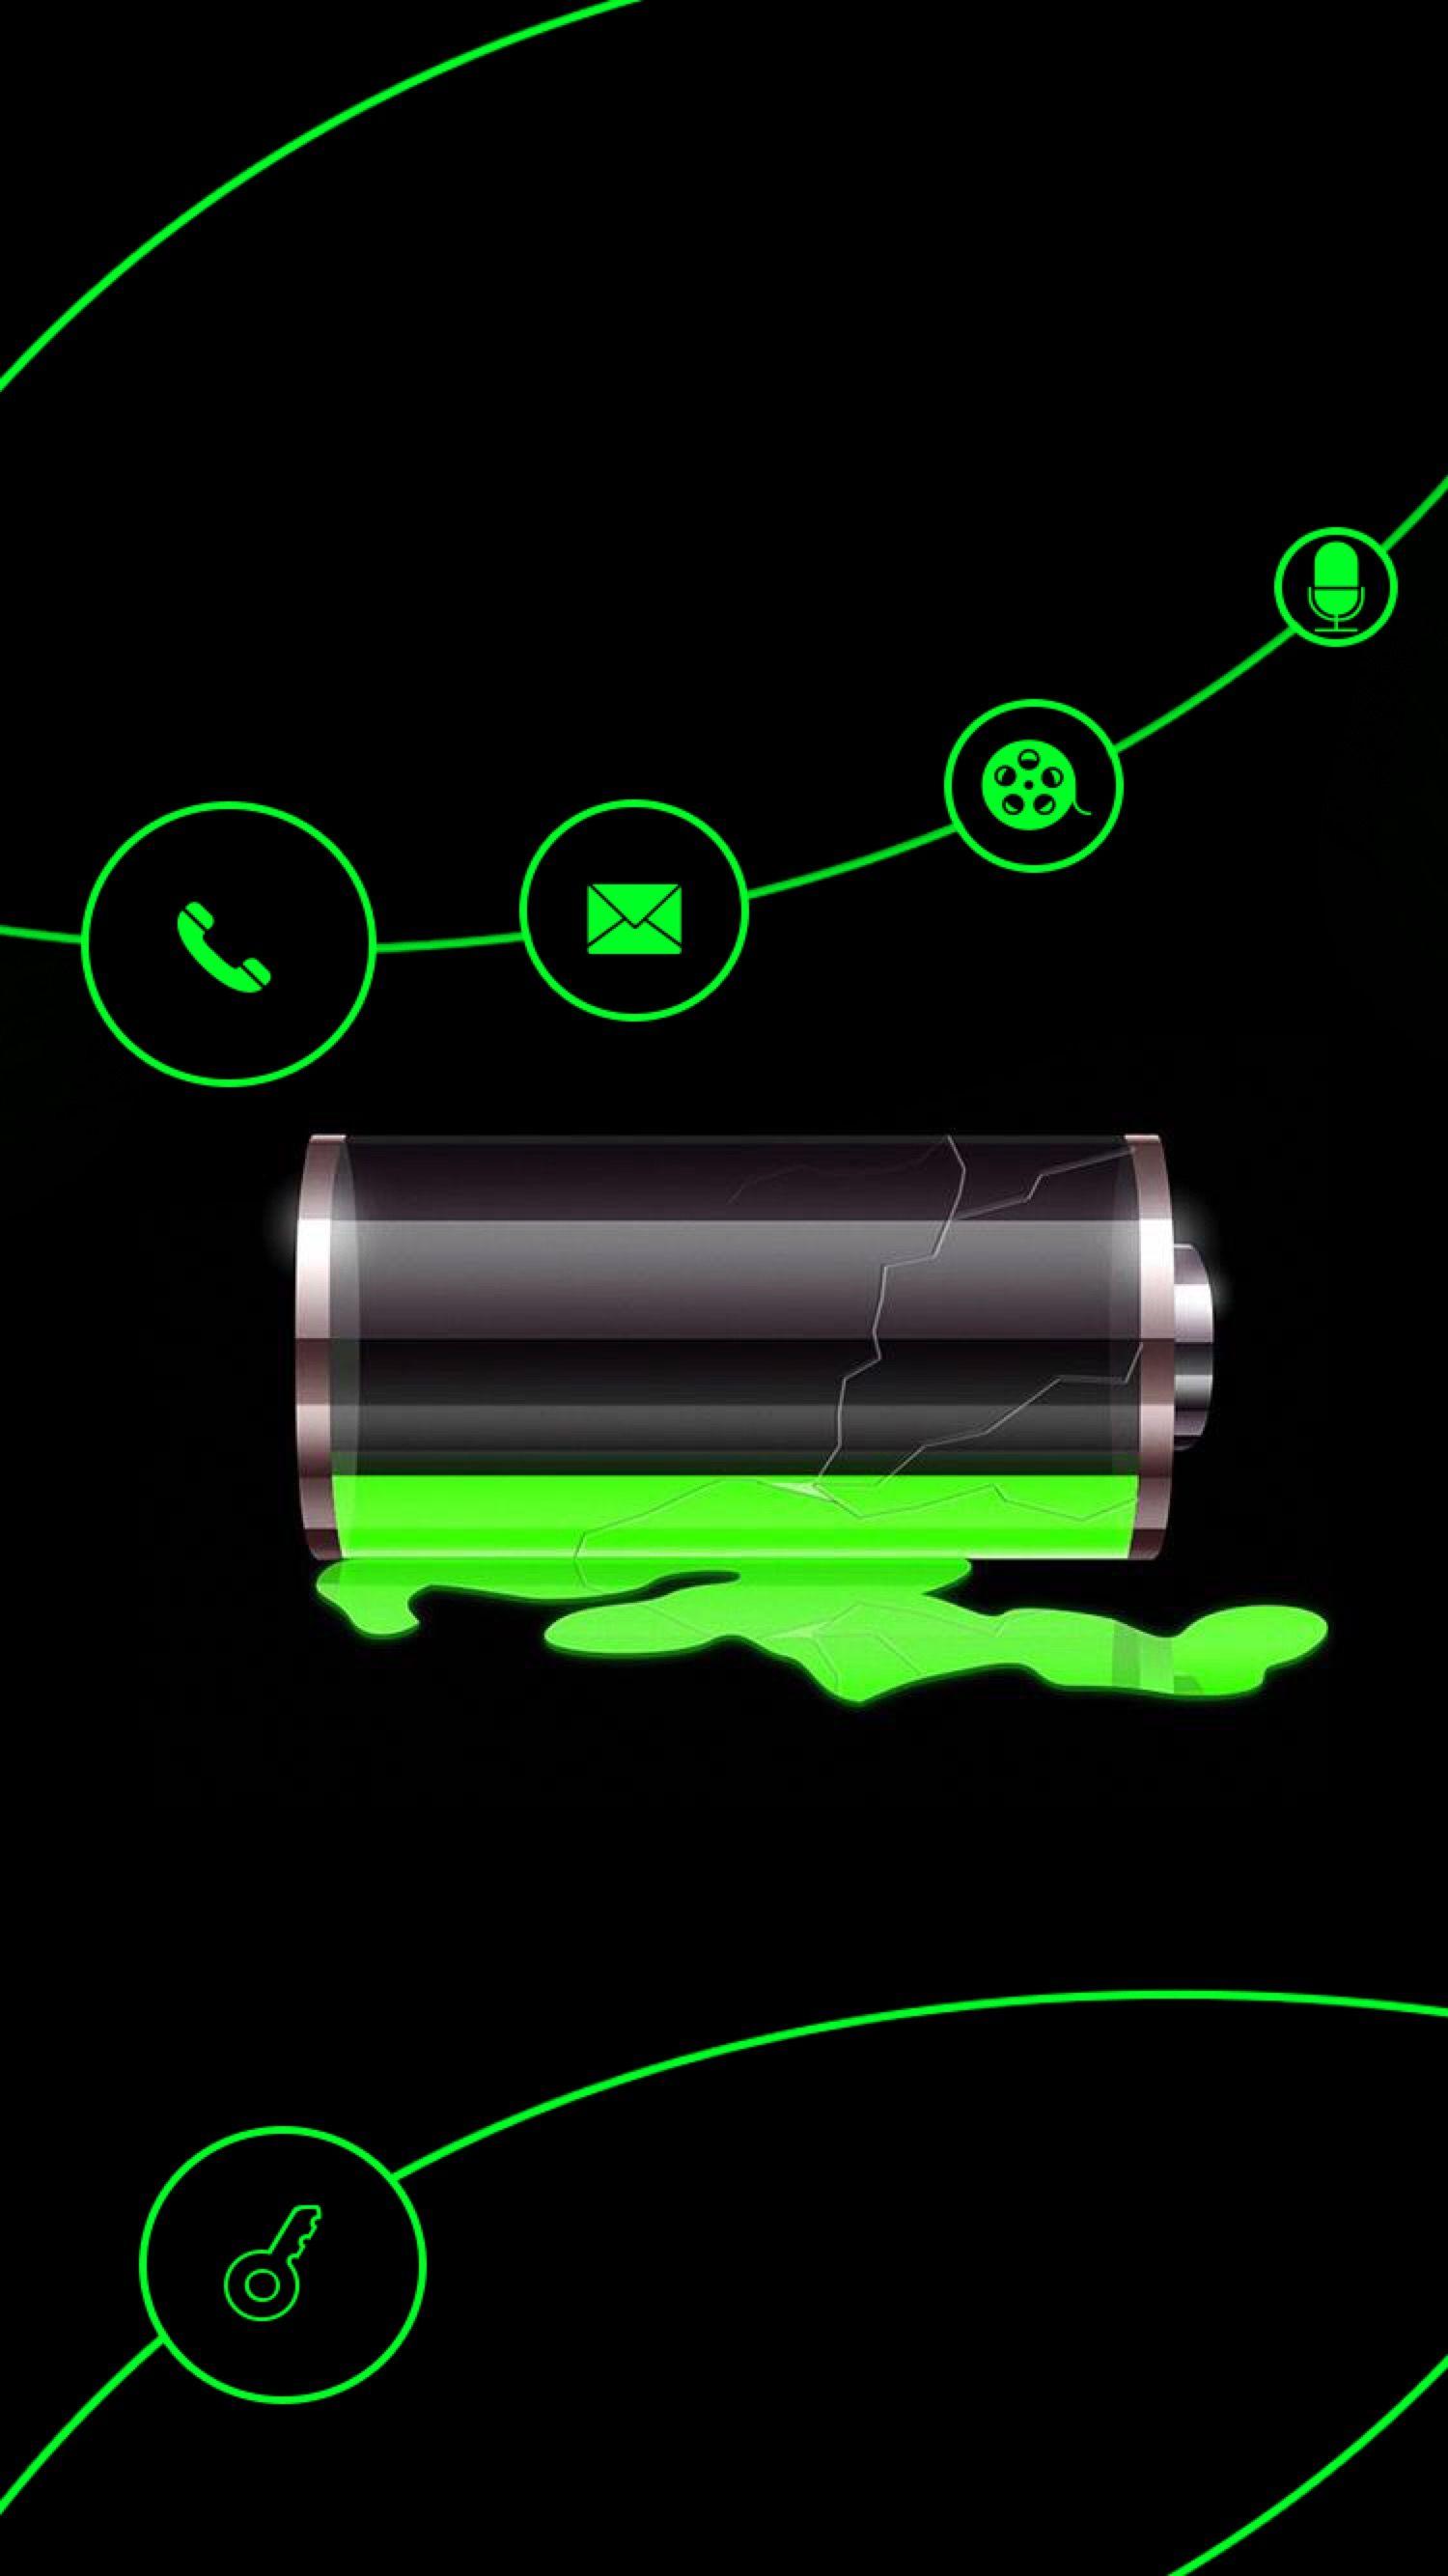 TAP AND GET THE FREE APP Lockscreens Art Creative Battery Charging Black Green